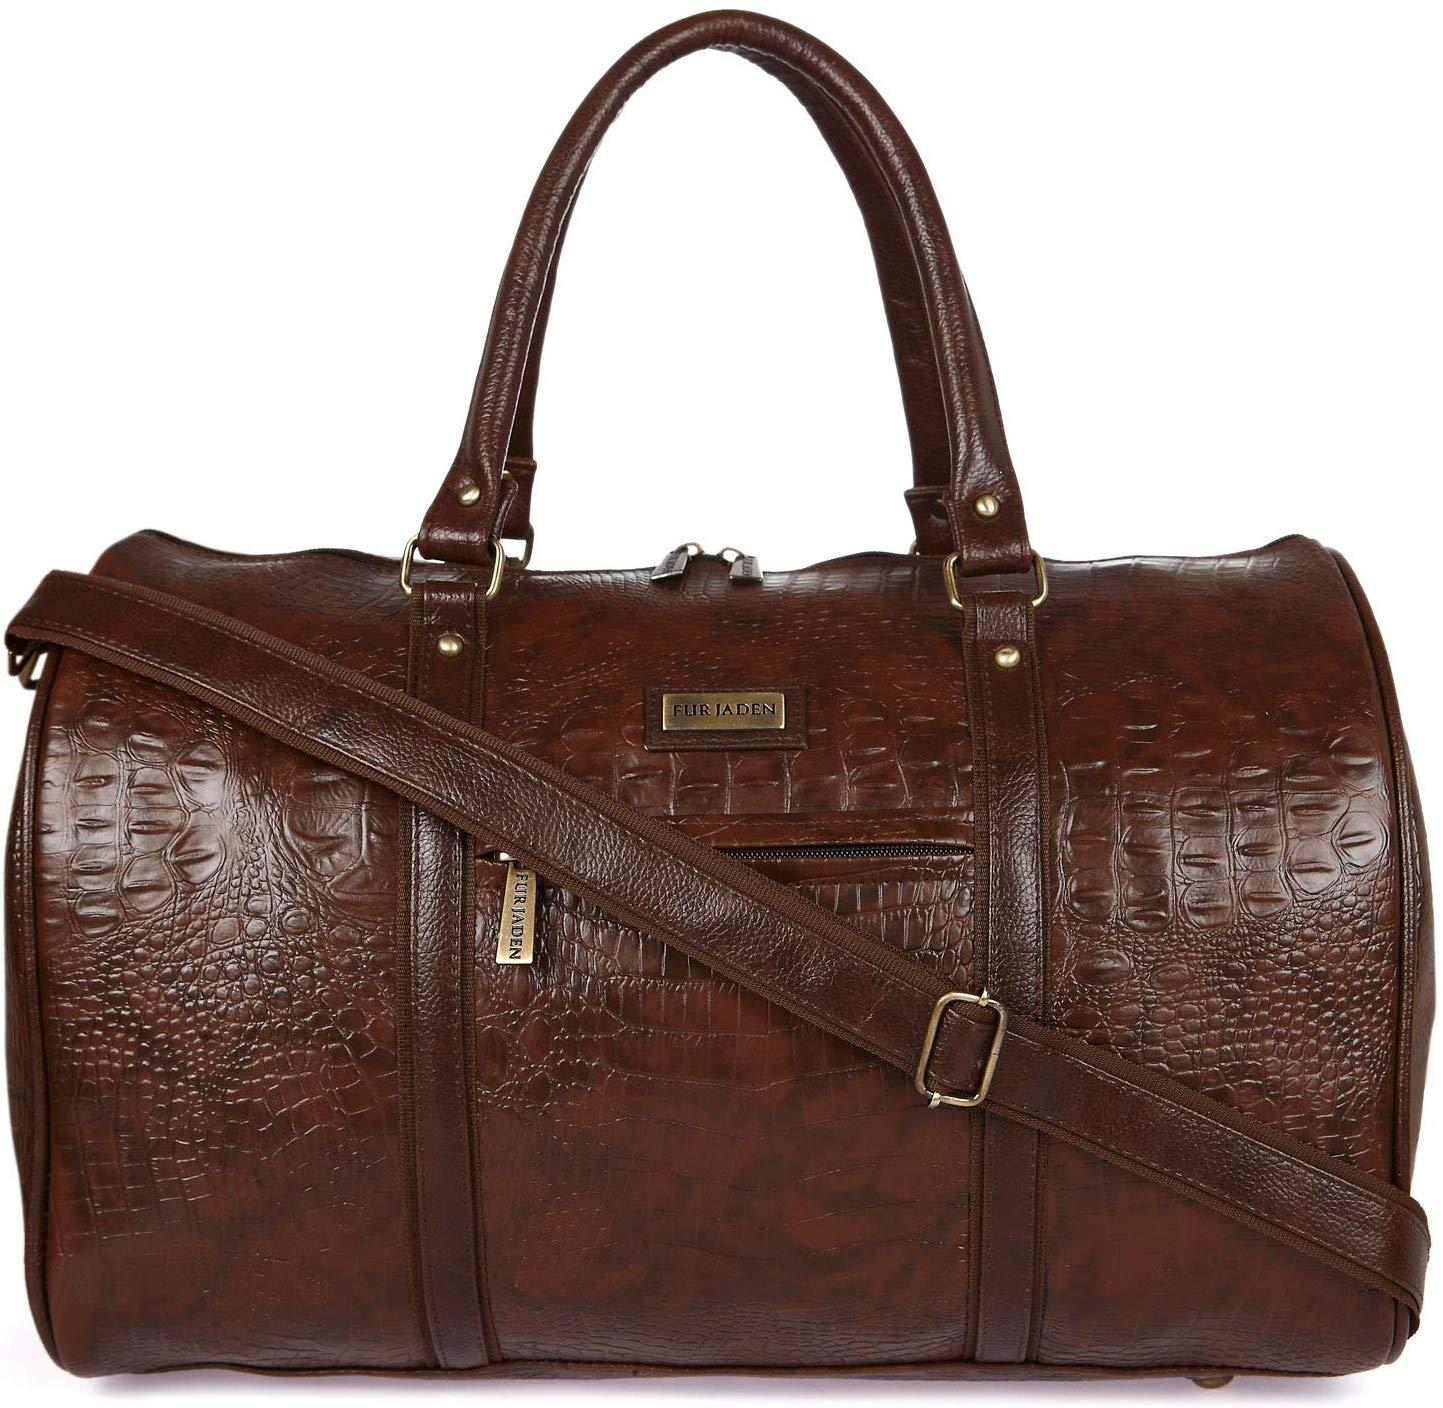 Fur Jaden Duffle Bag